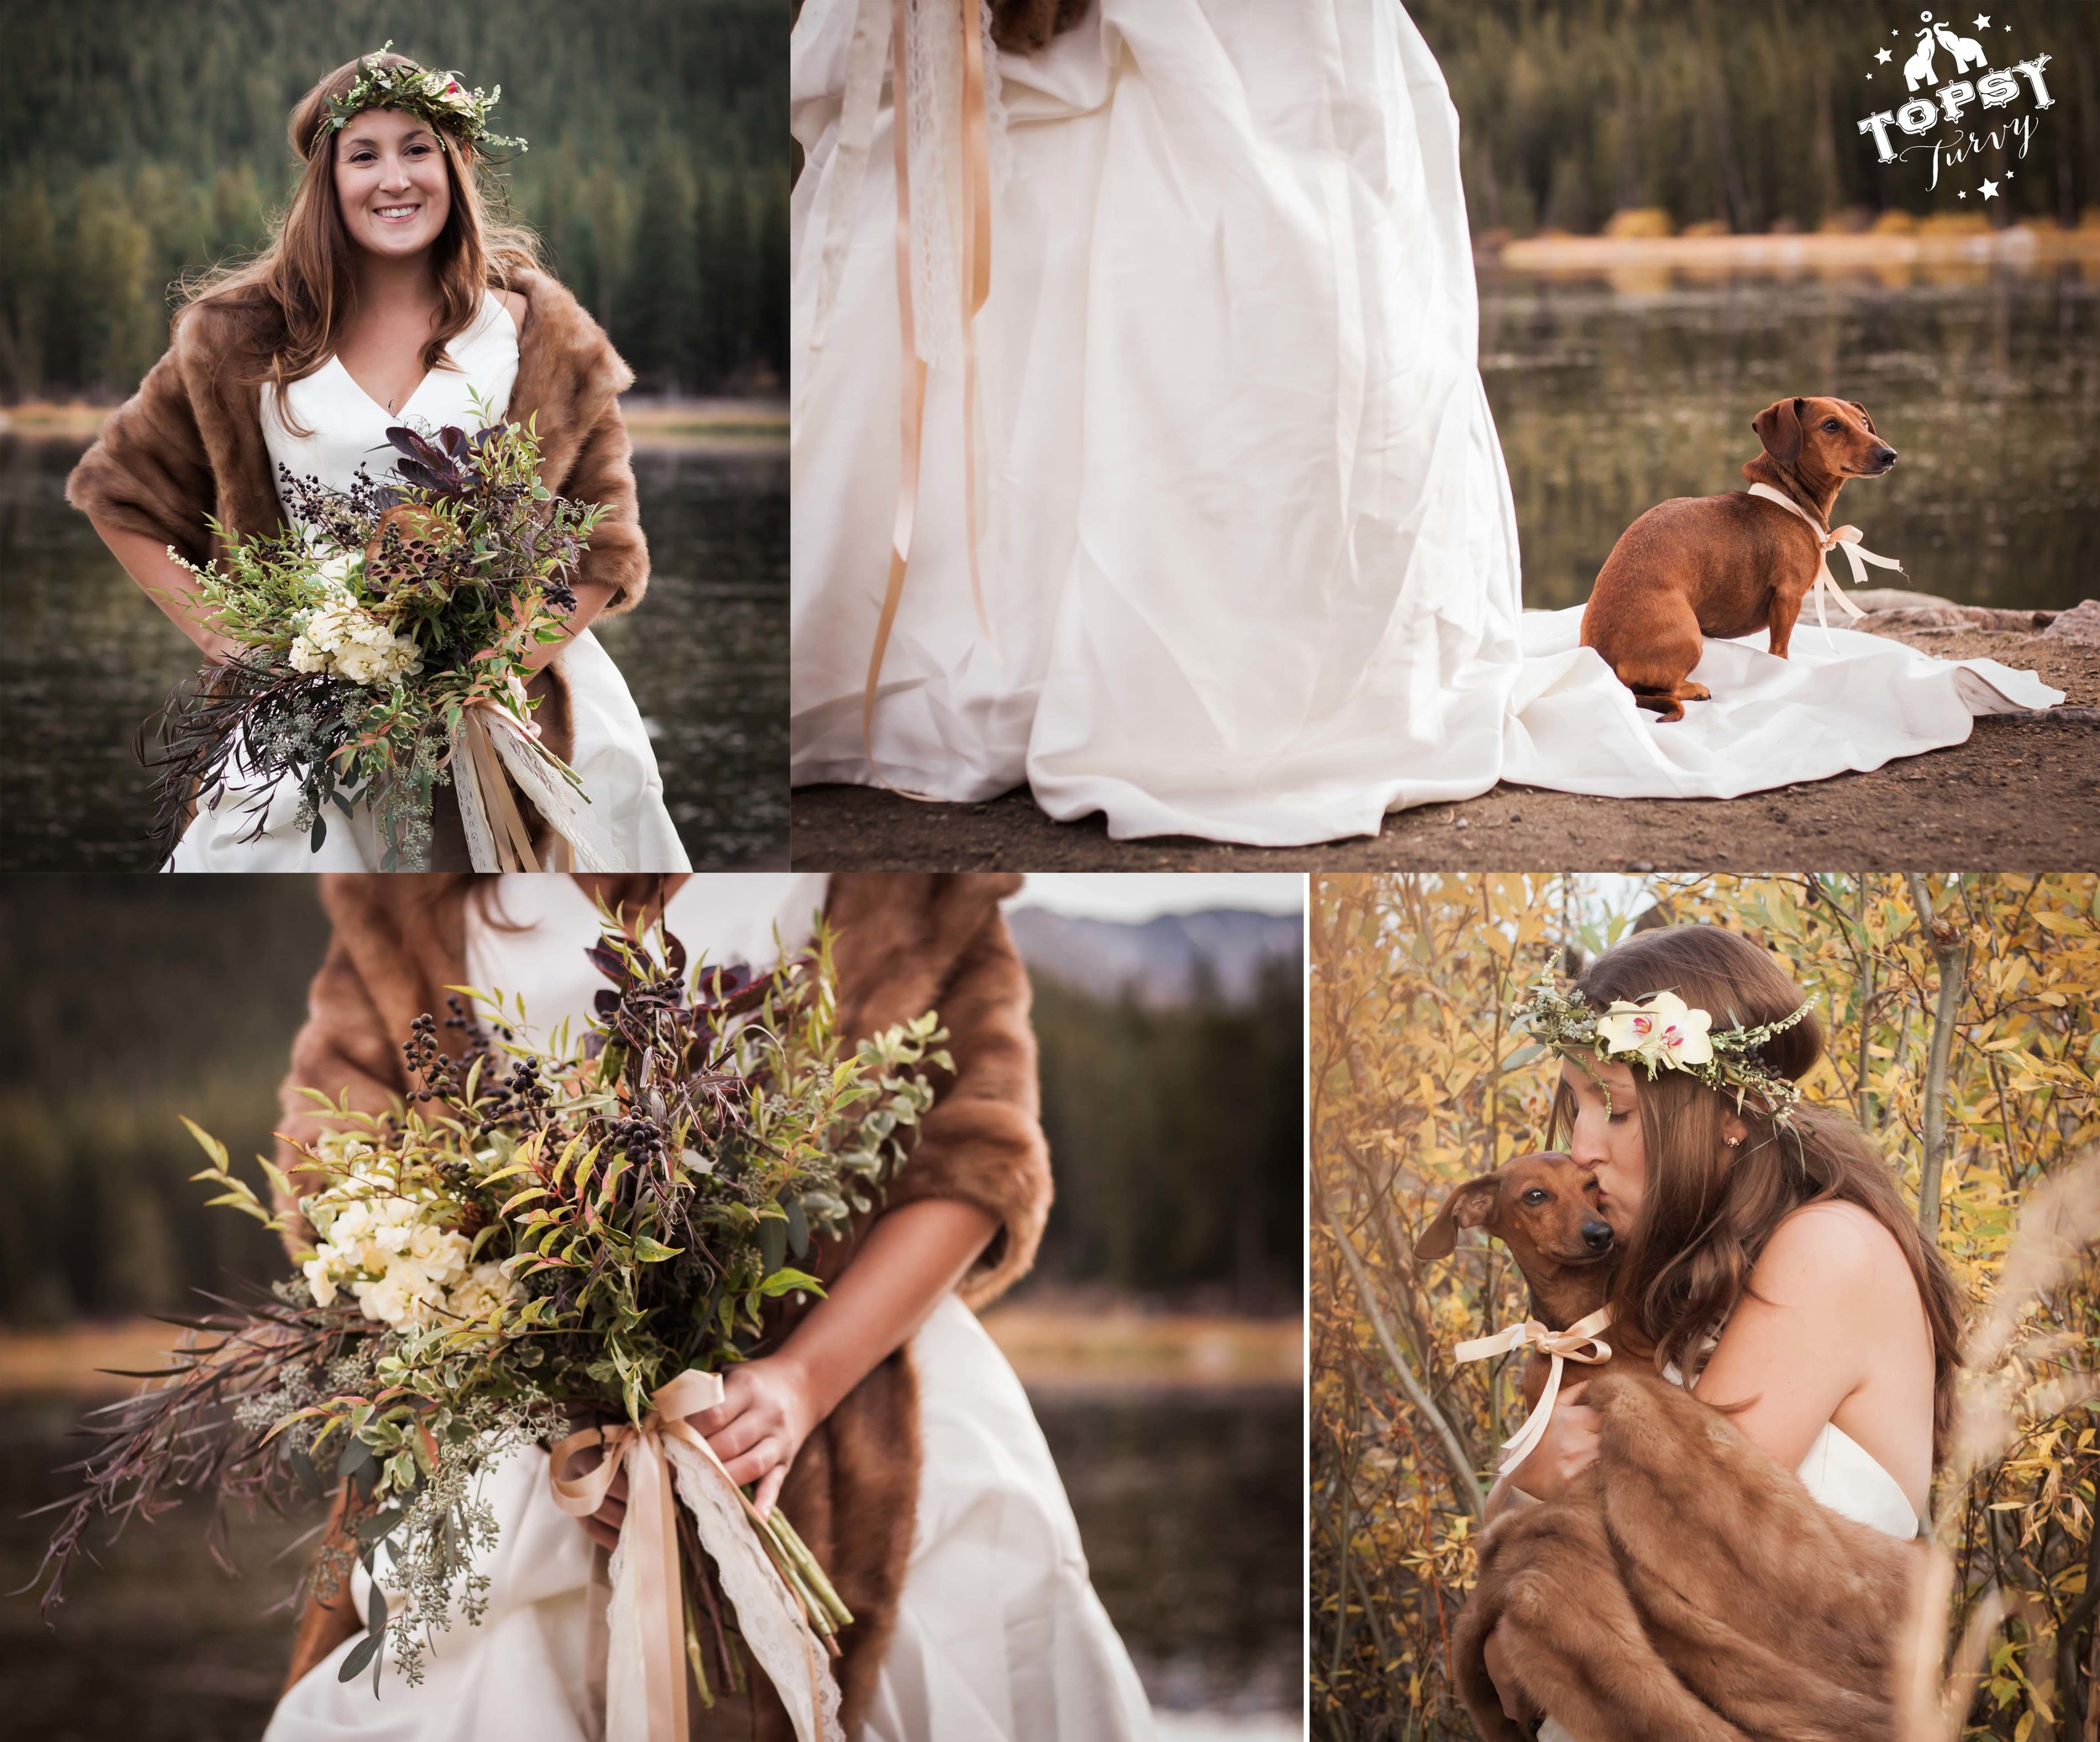 Styled Shoot Contributors:  Wedding Treasures Bridal  &  Amore Fiori